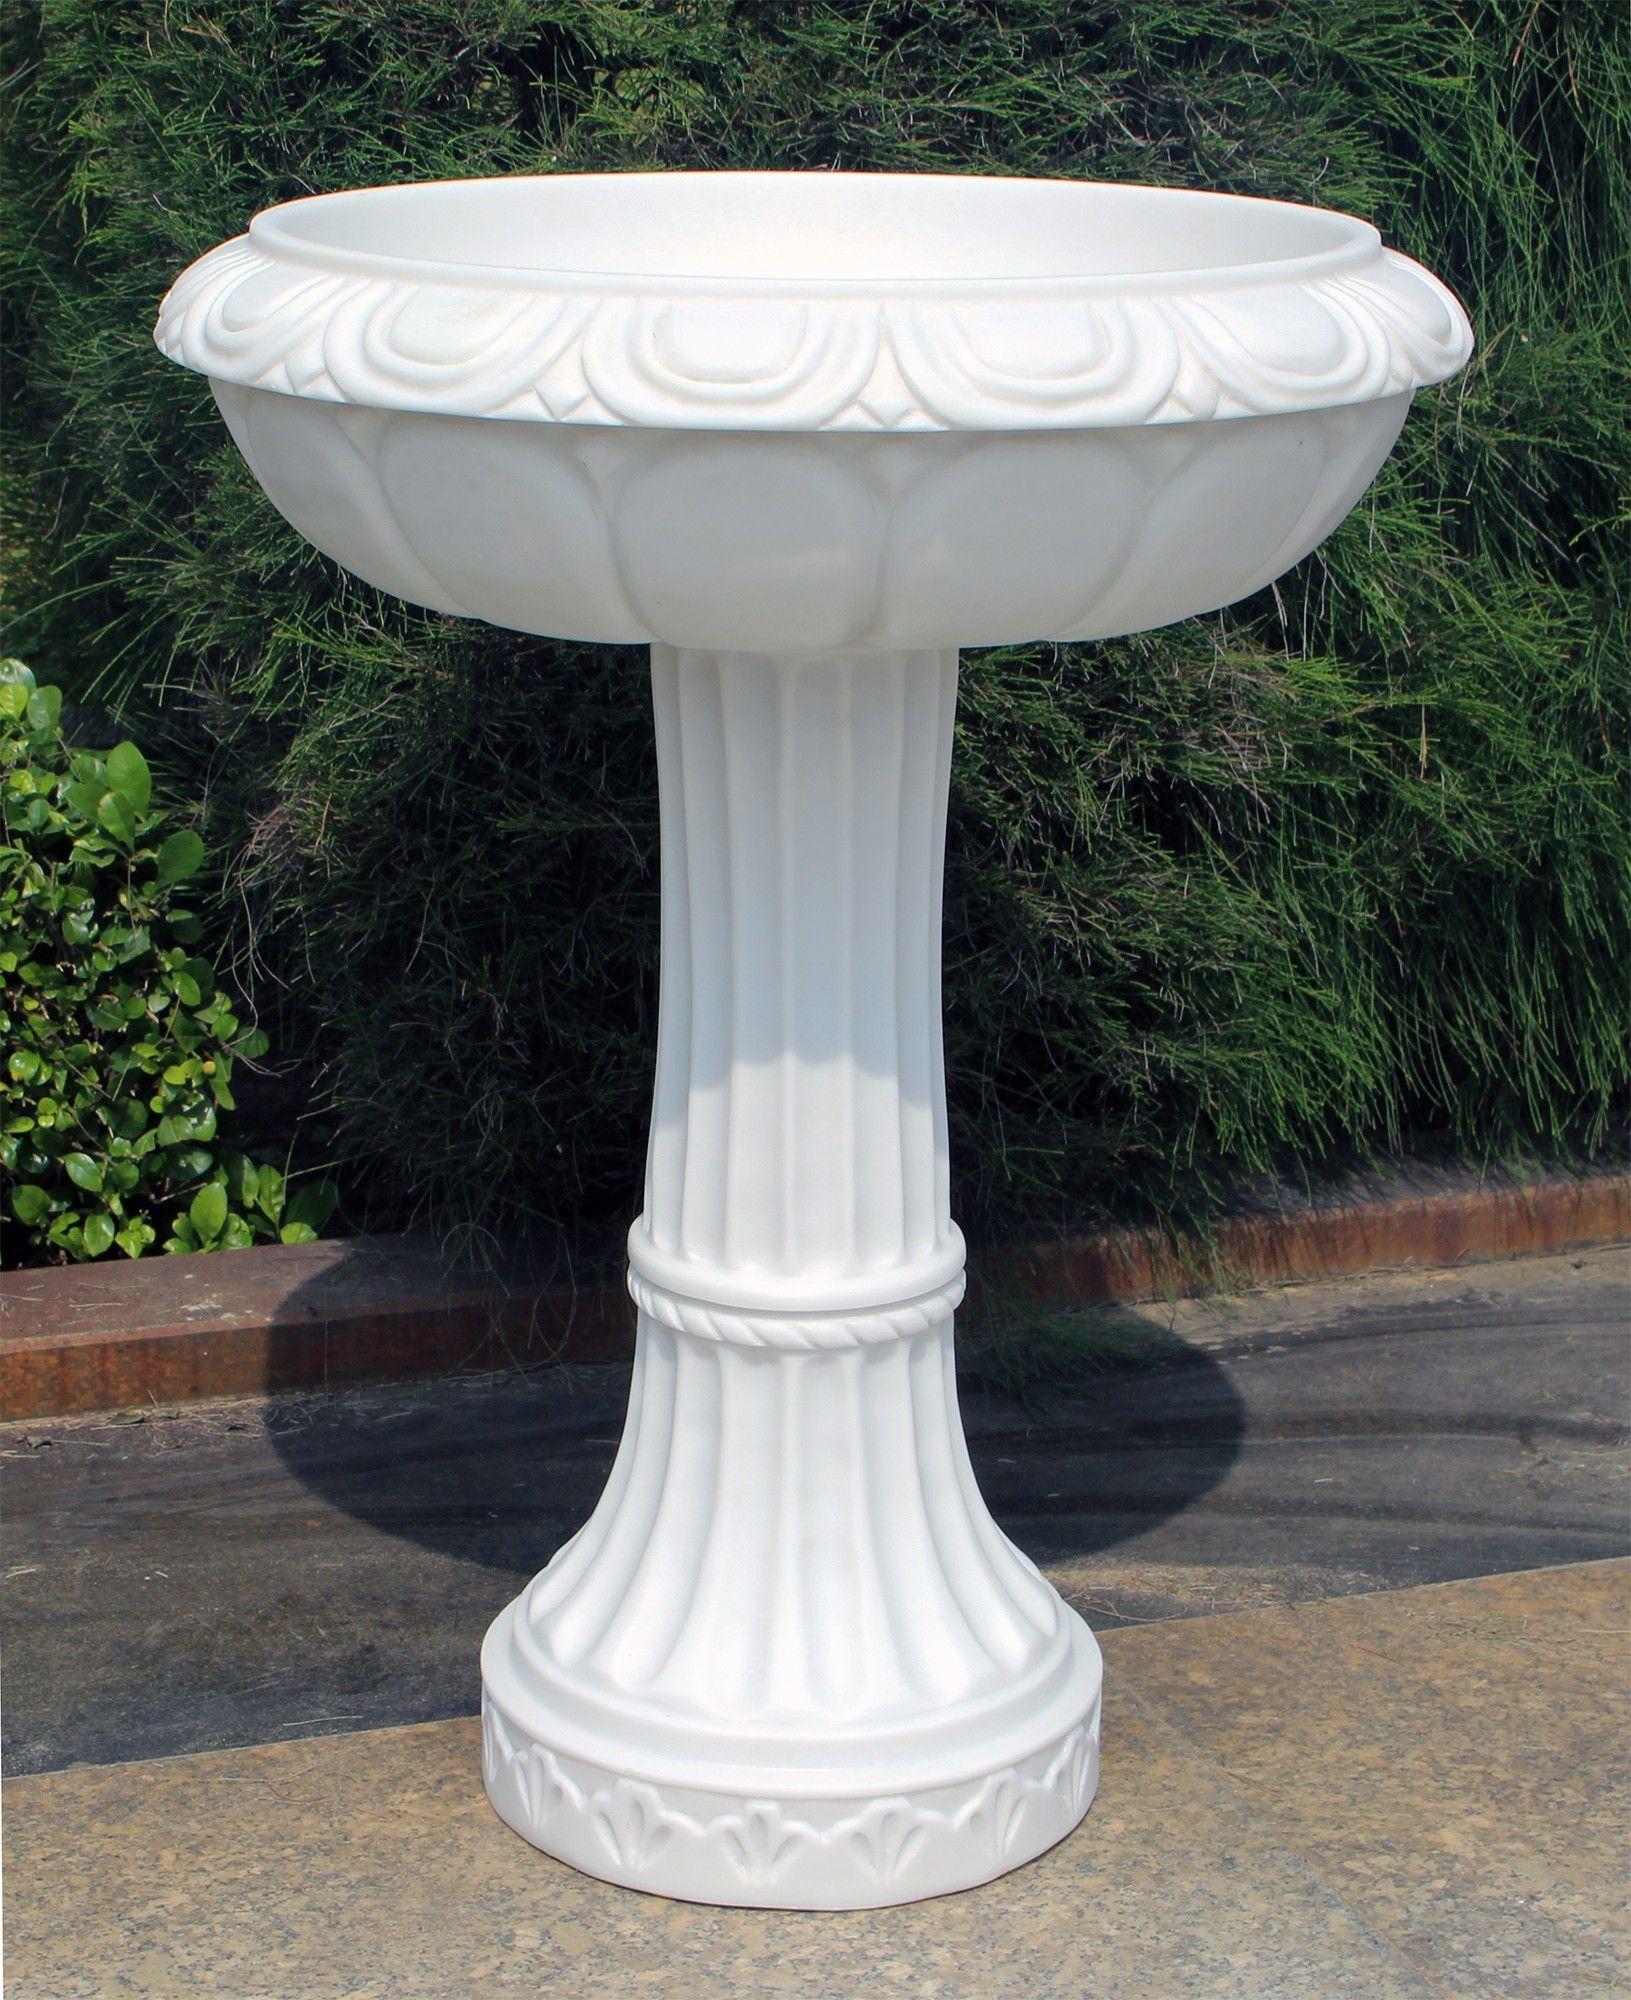 page pedestals category garden old leinster pedestal the mould